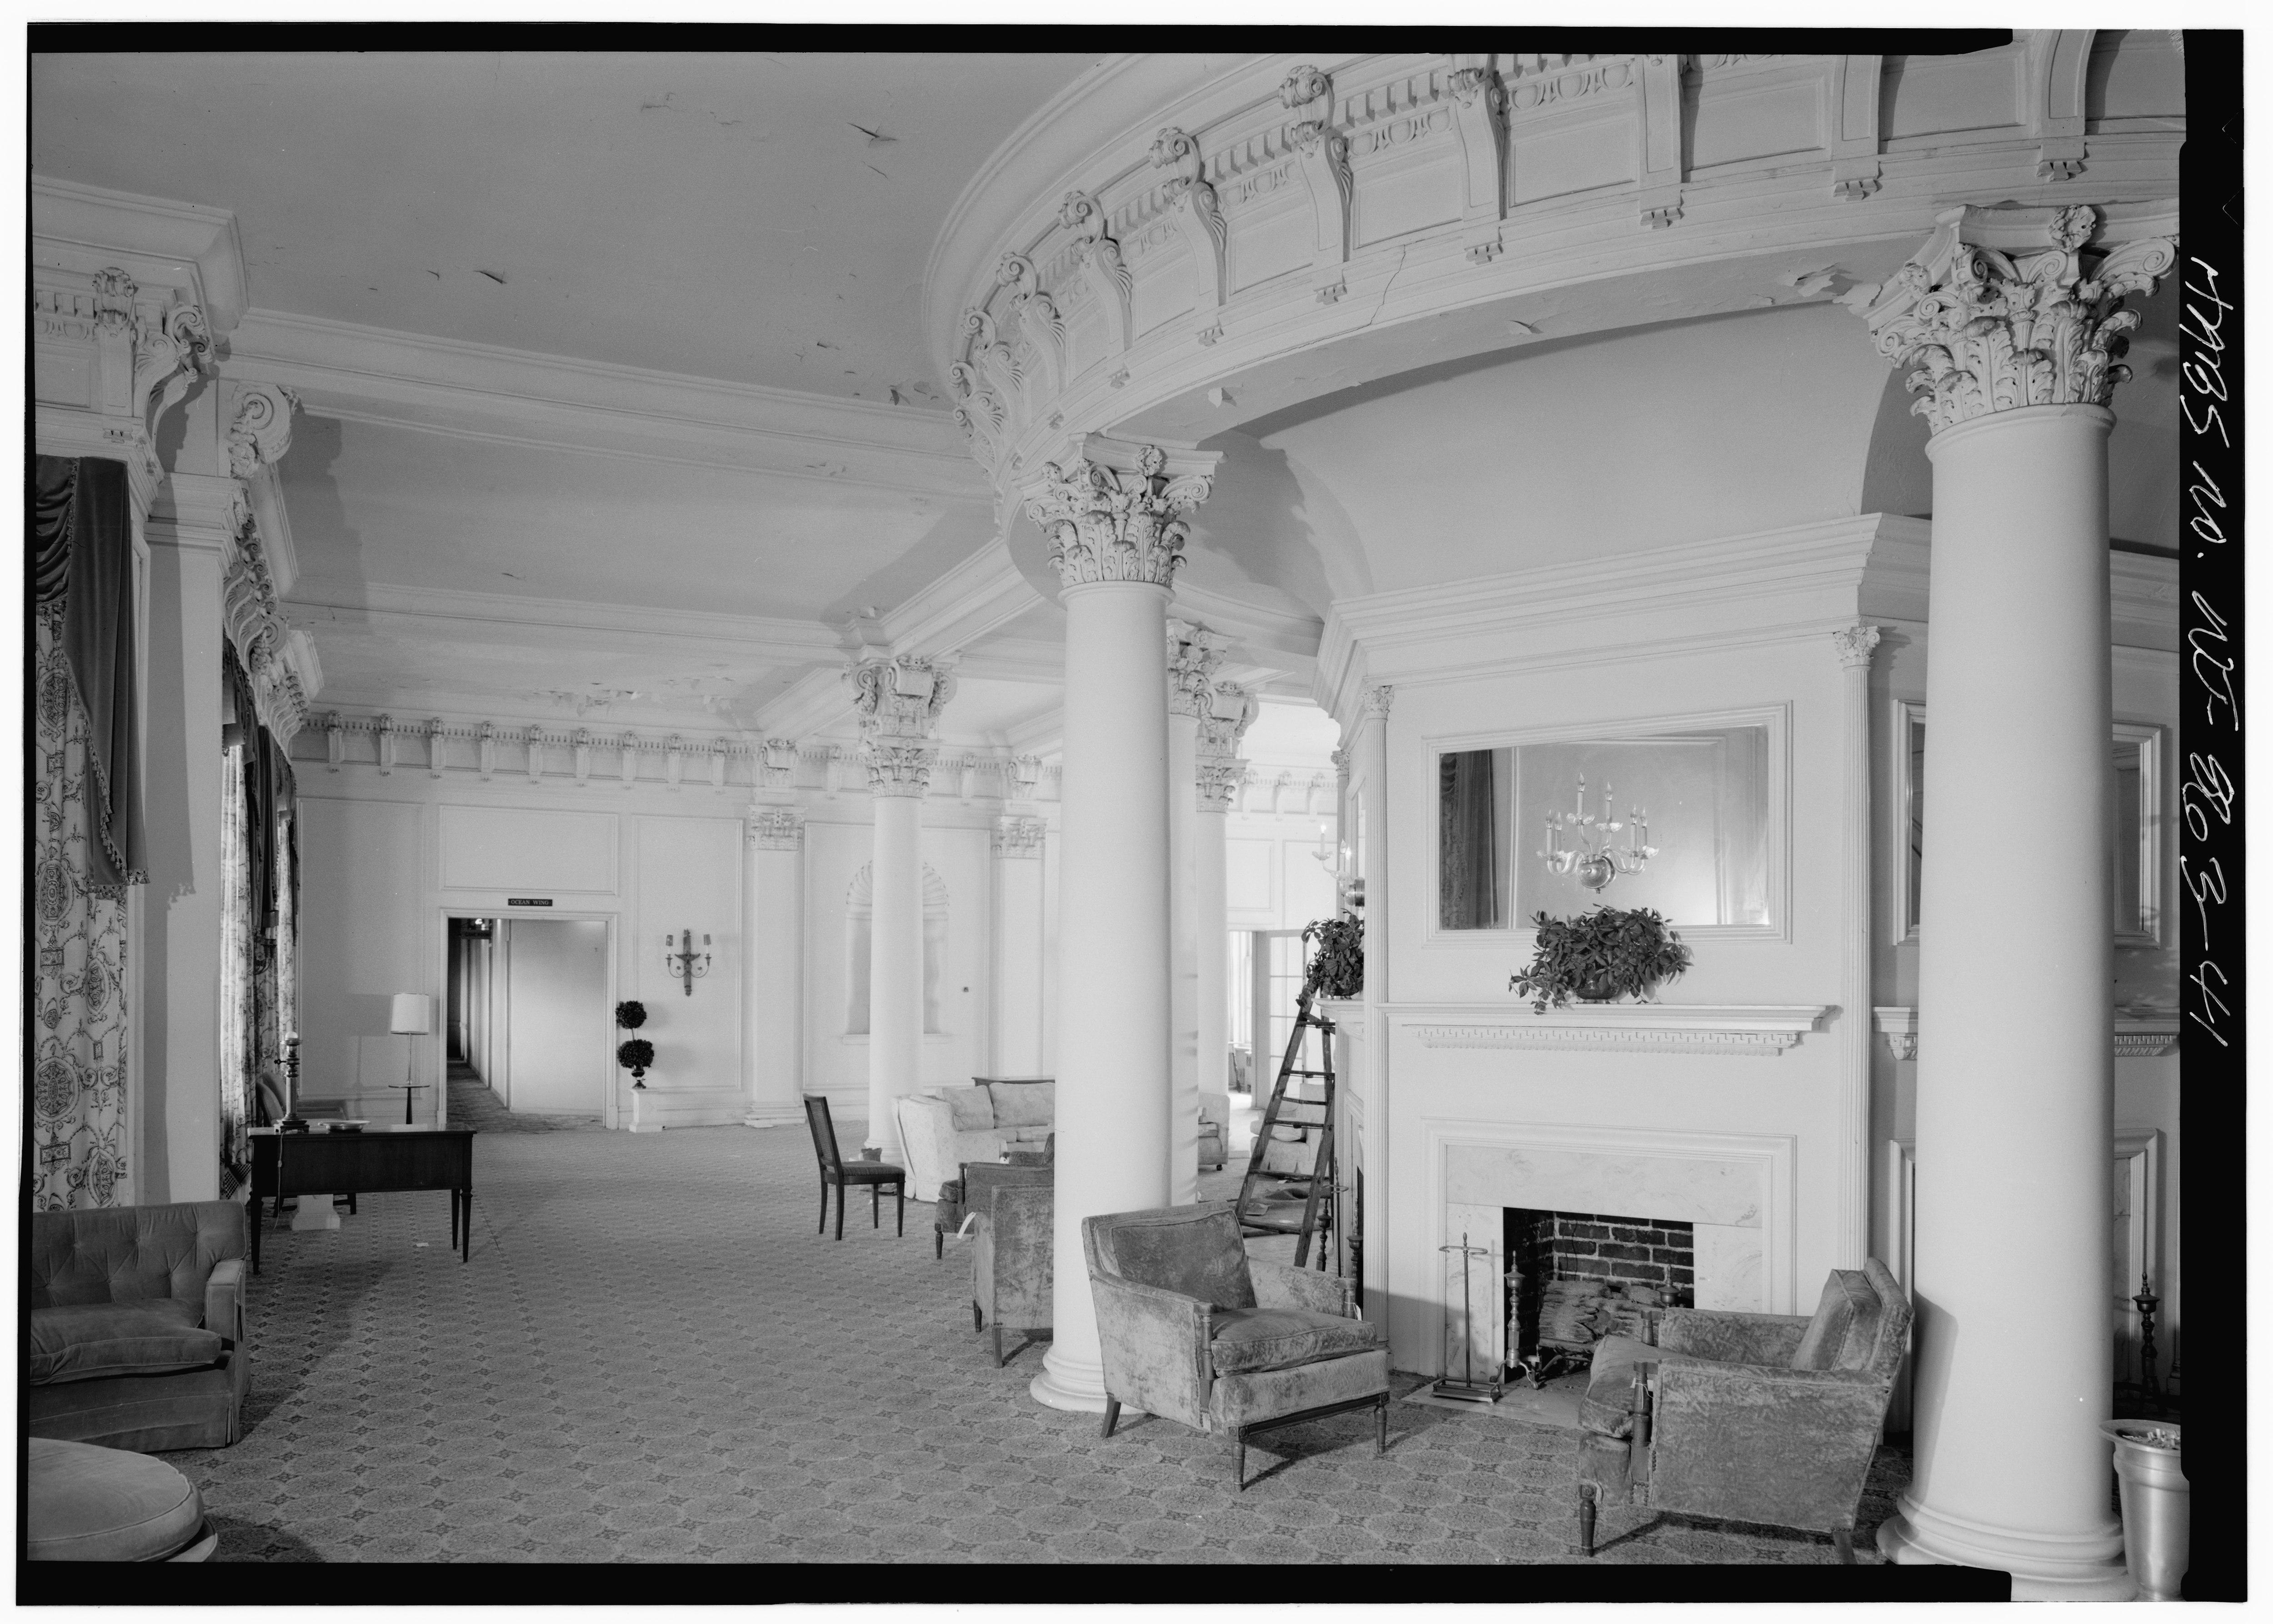 Hotel Congress Rooms